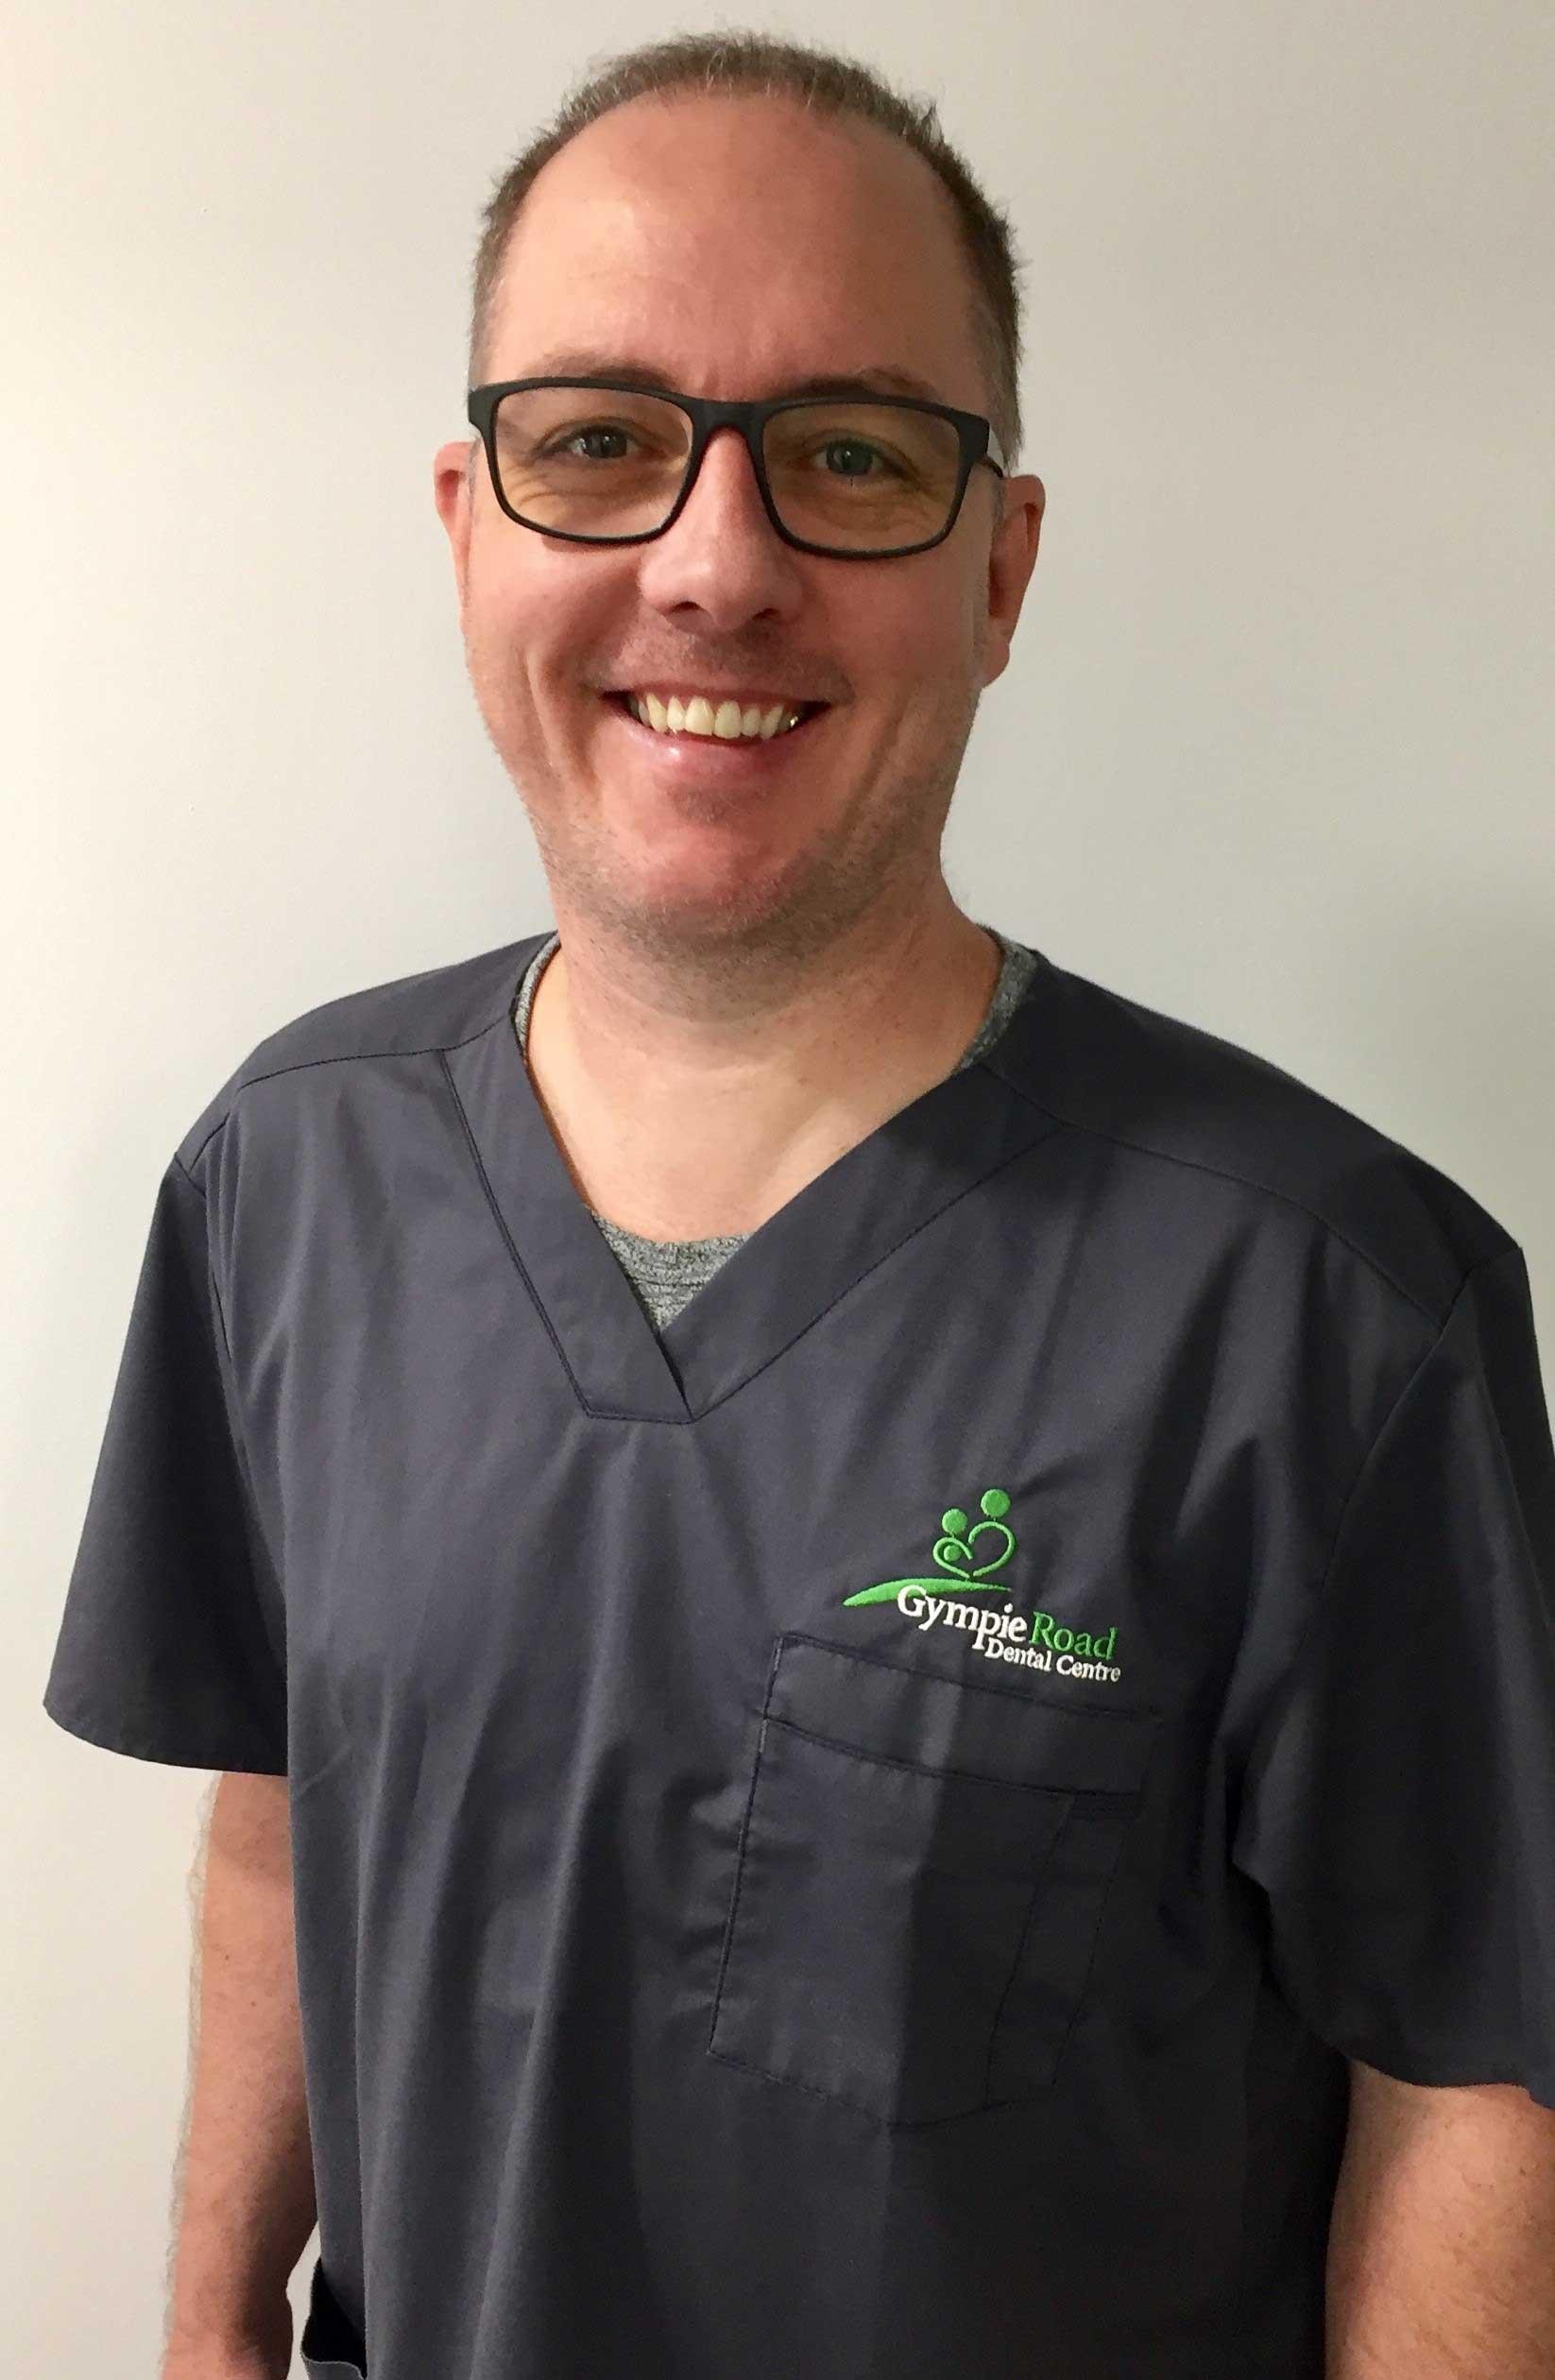 Simon | Gympie Road Dental Dentist